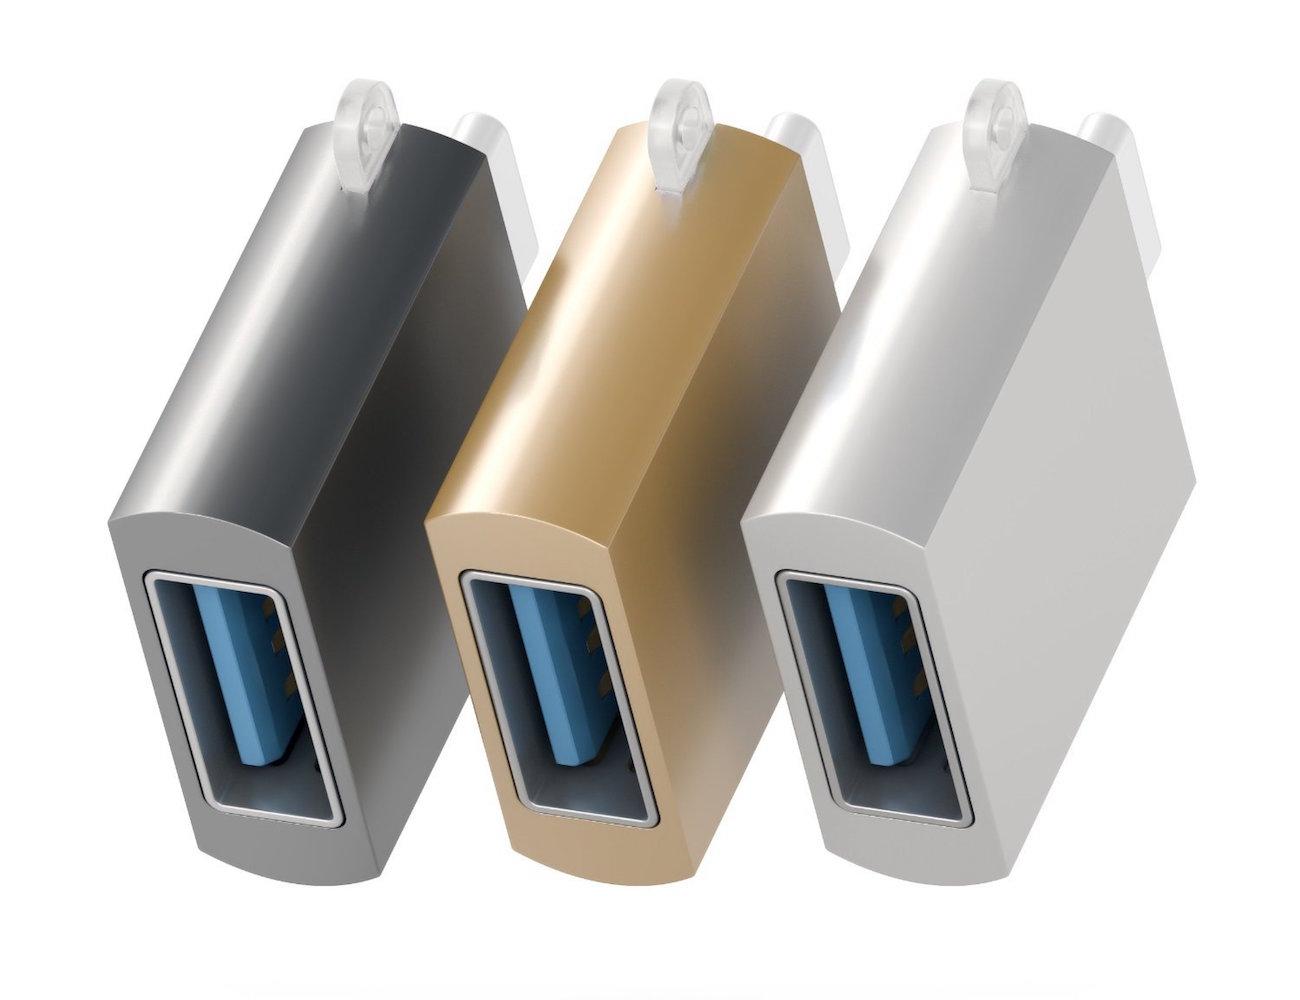 Satechi Type-C USB Adapter